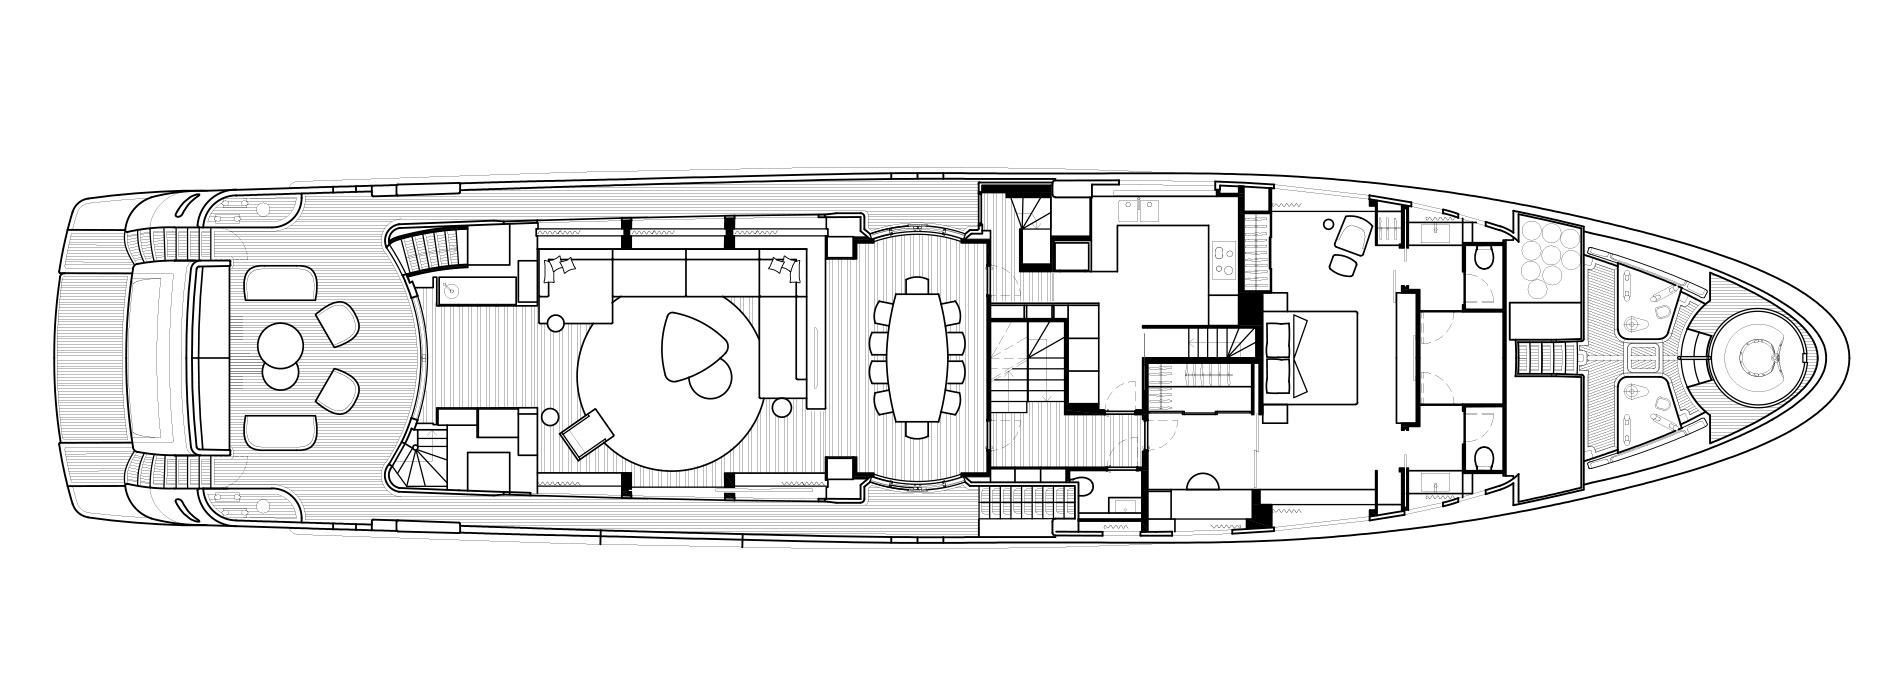 Sanlorenzo Yachts SD126 主甲板 Versione B